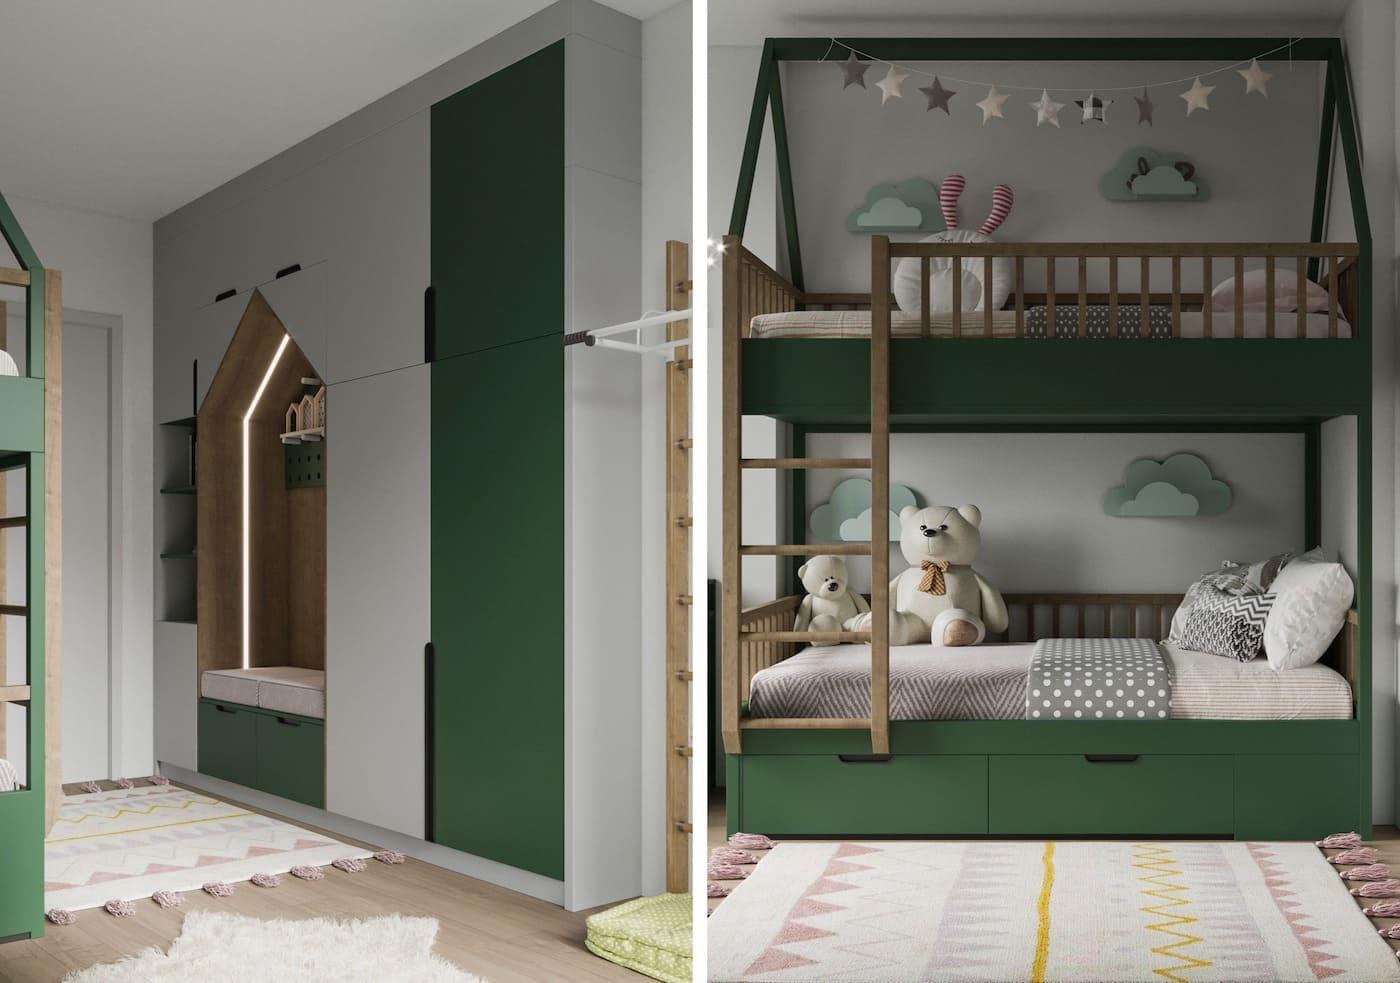 интерьер детской комнаты фото 5